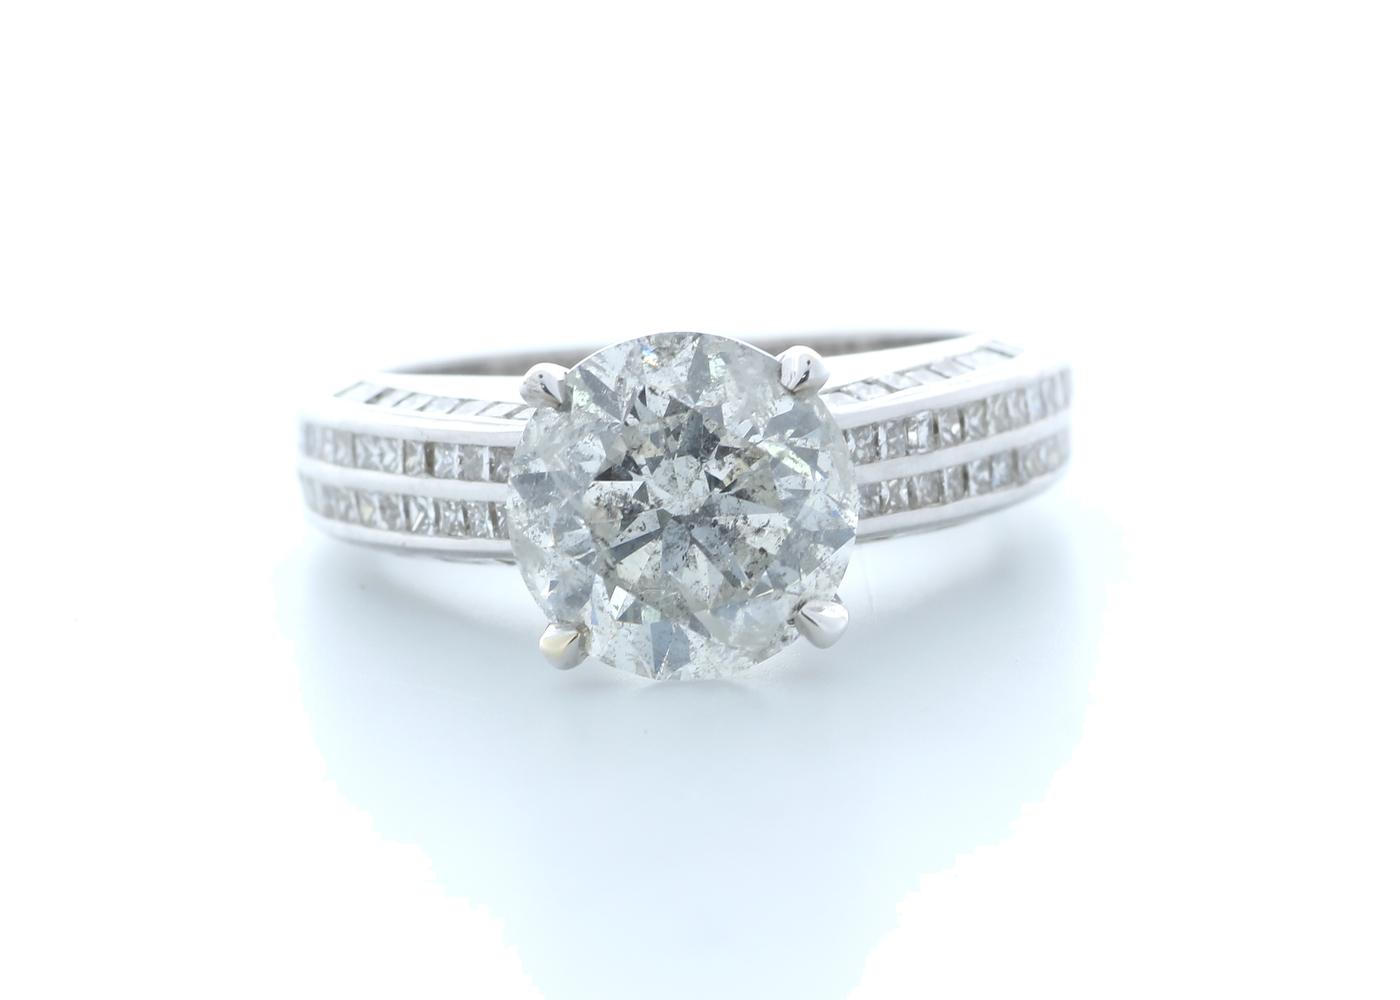 18ct White Gold Diamond Ring 4.51 (3.57) Carats